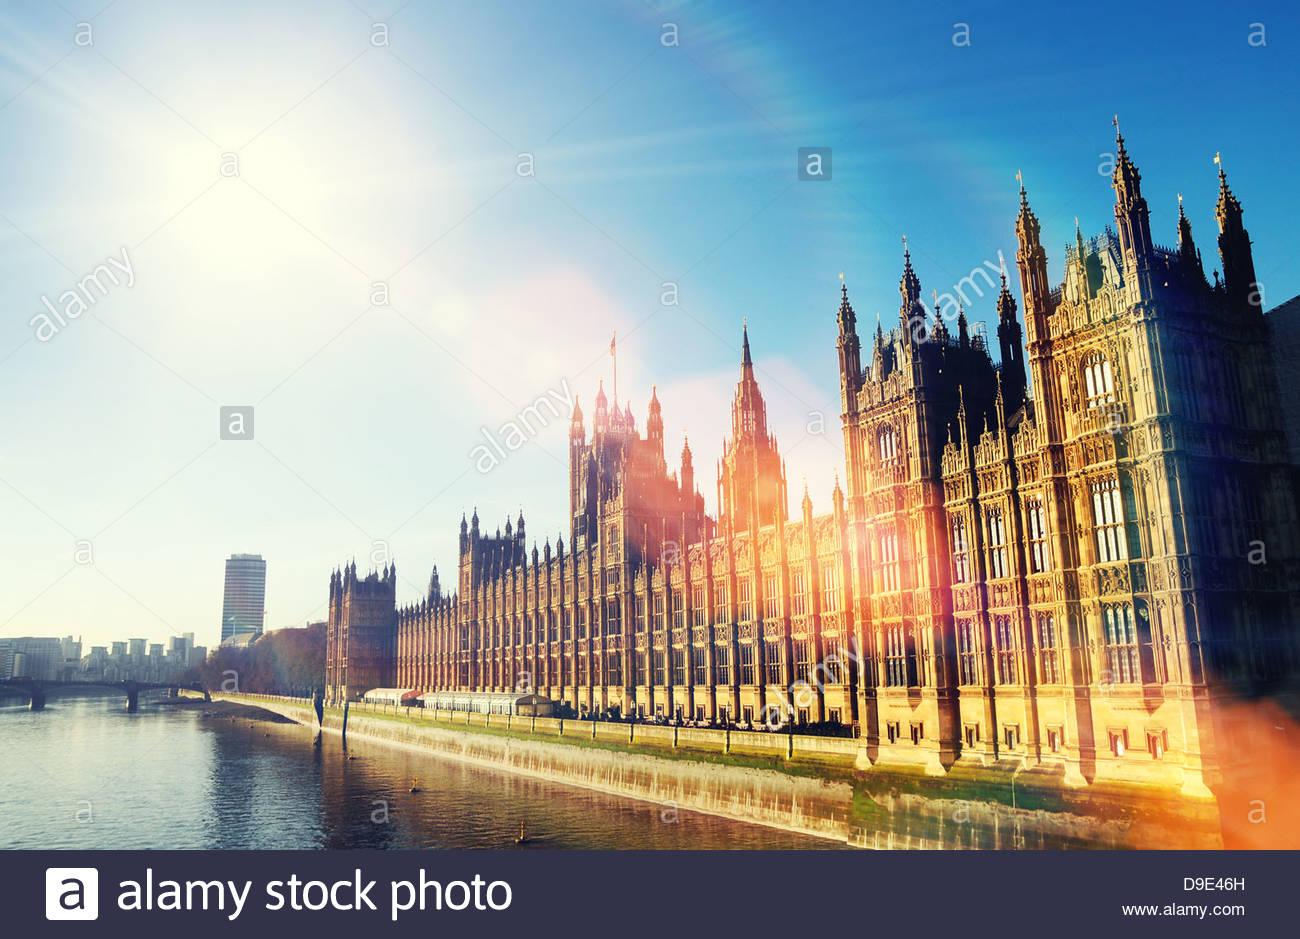 sunshine parliament - Stock Image